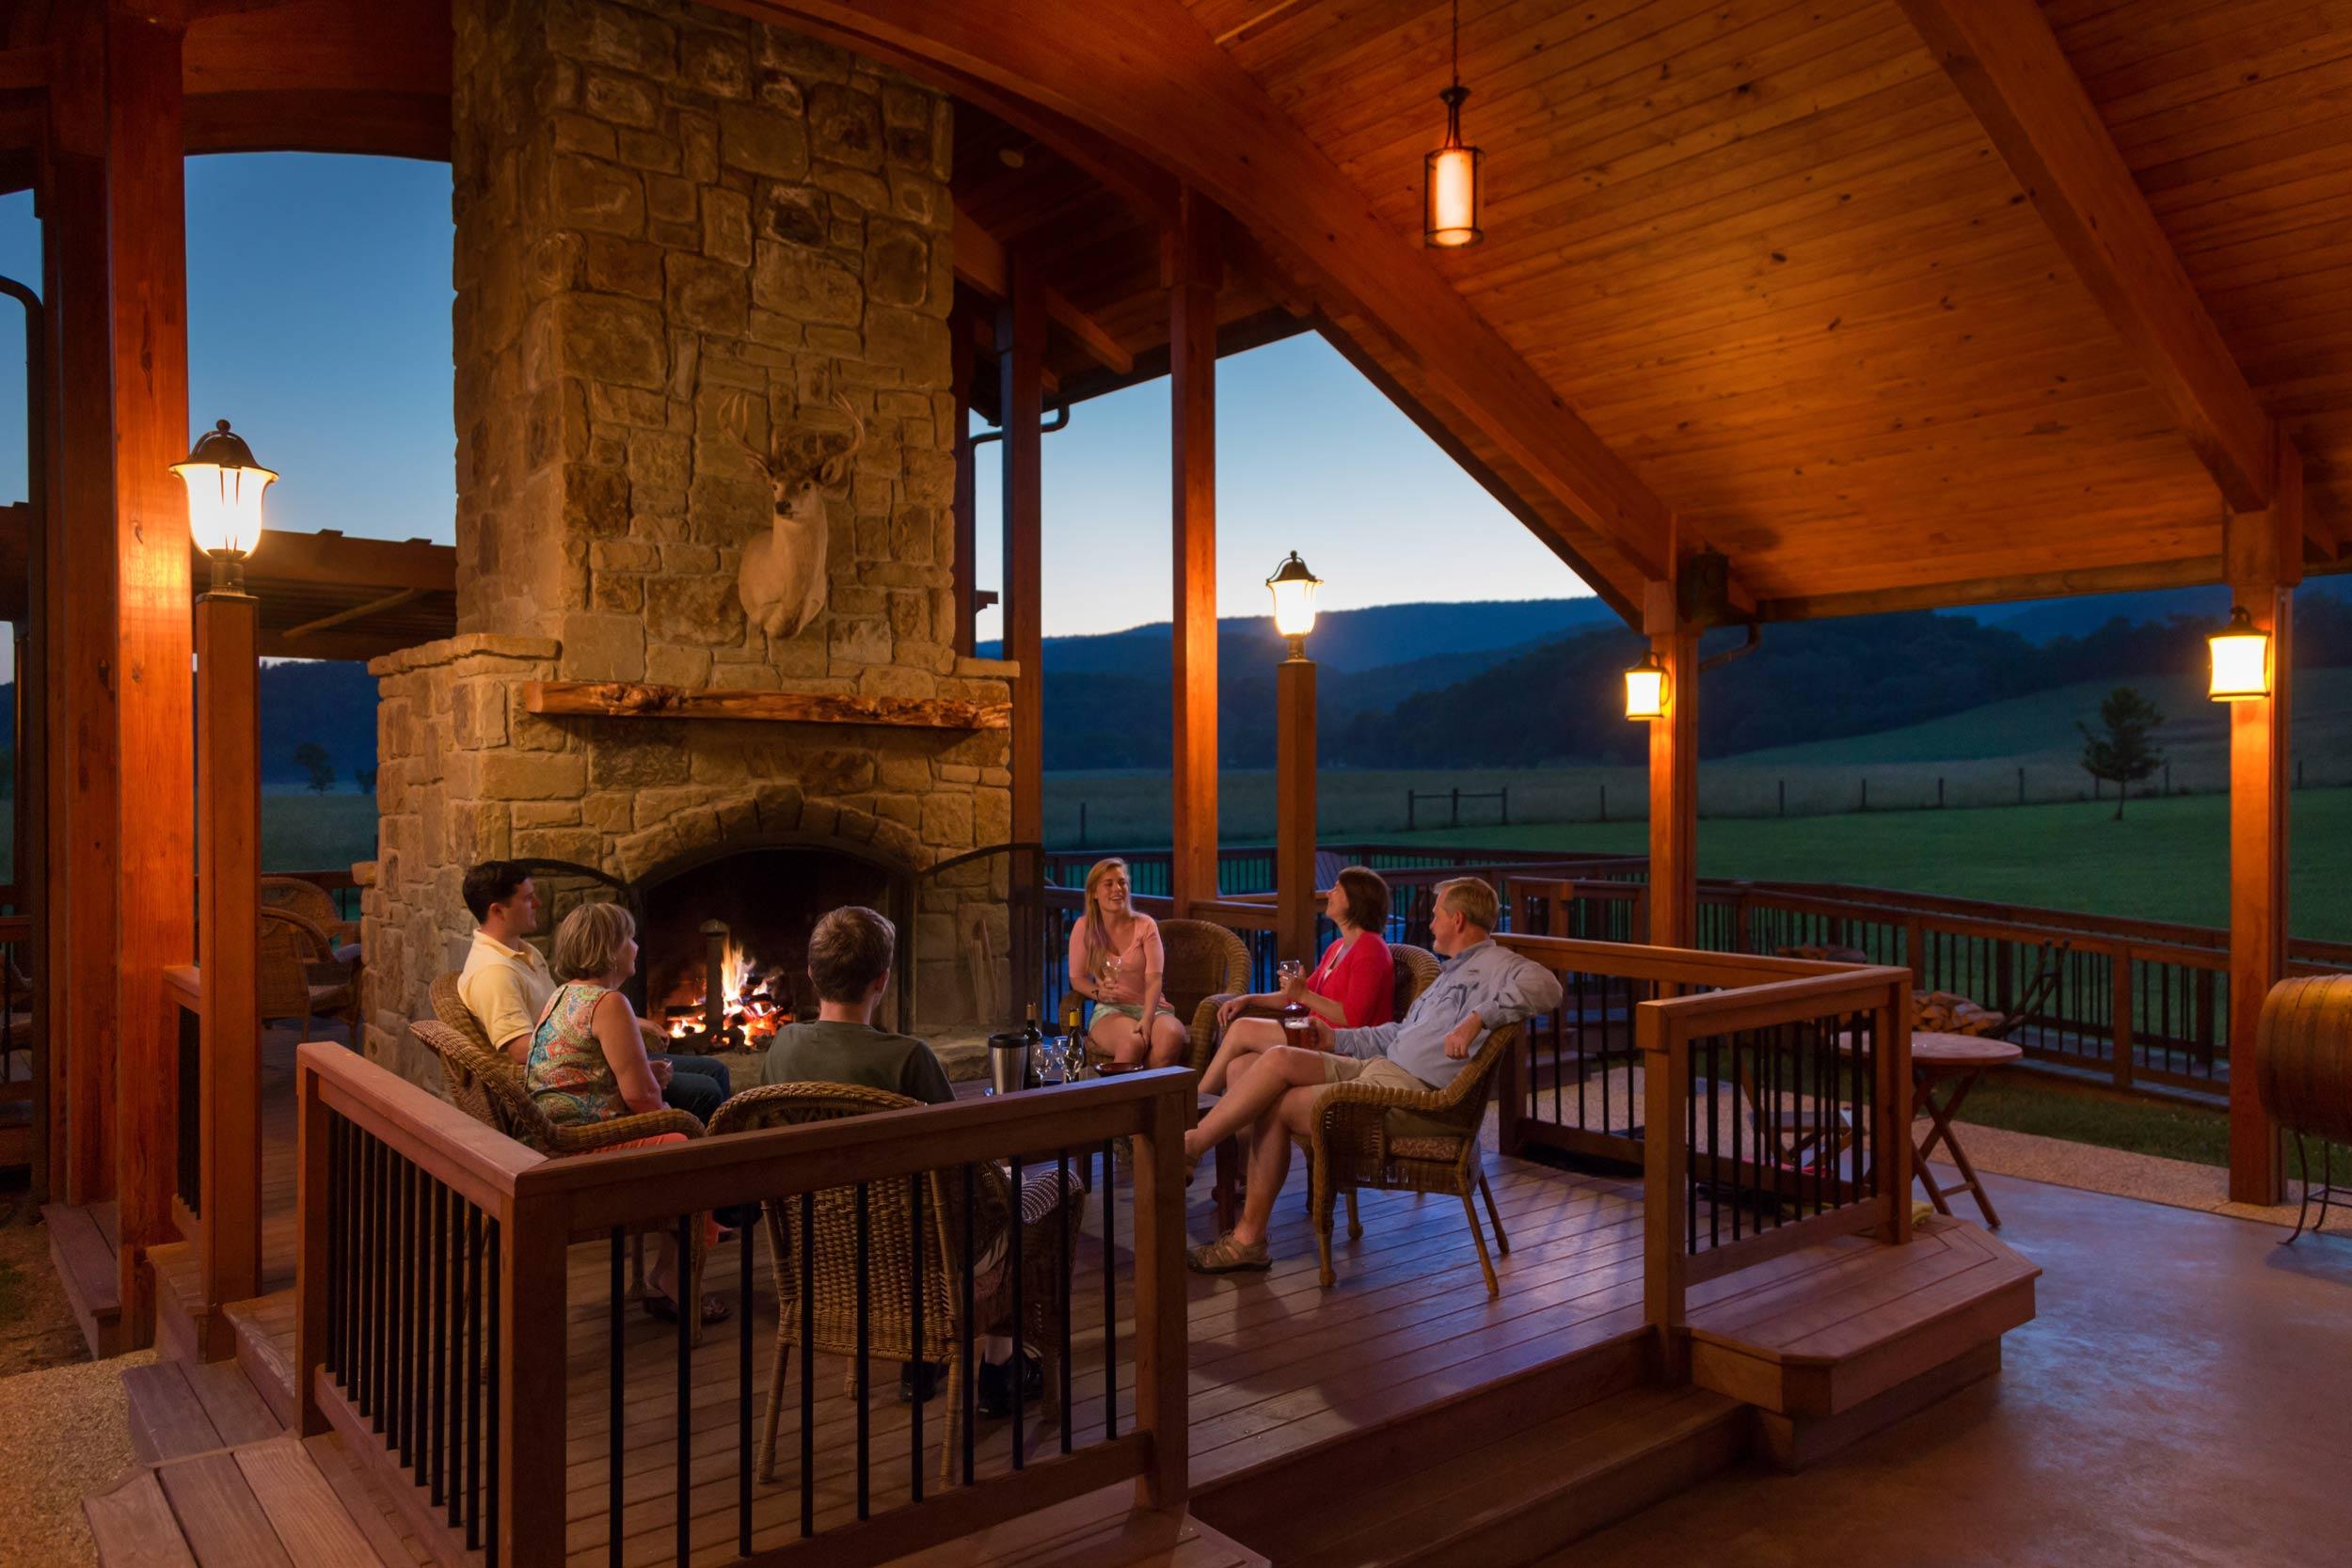 hotel colorado facilities cabins springs mountains san photos juan luxury hot hotels dunton states united smith